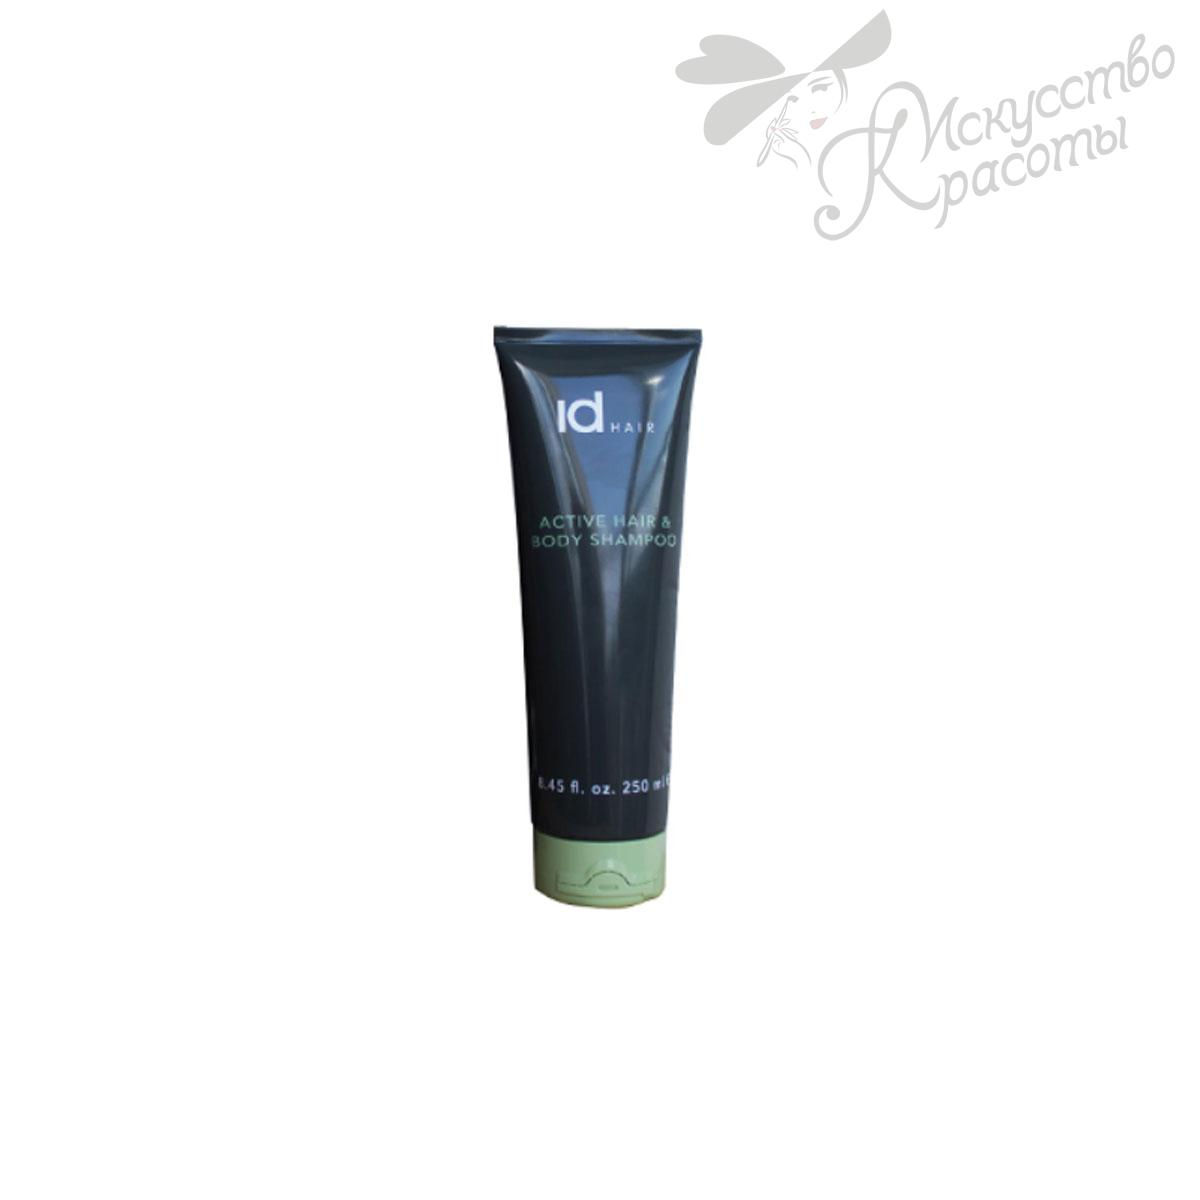 Активный шампунь для волос и тела Active Hair and Body Shampoo ID Hair 250 мл